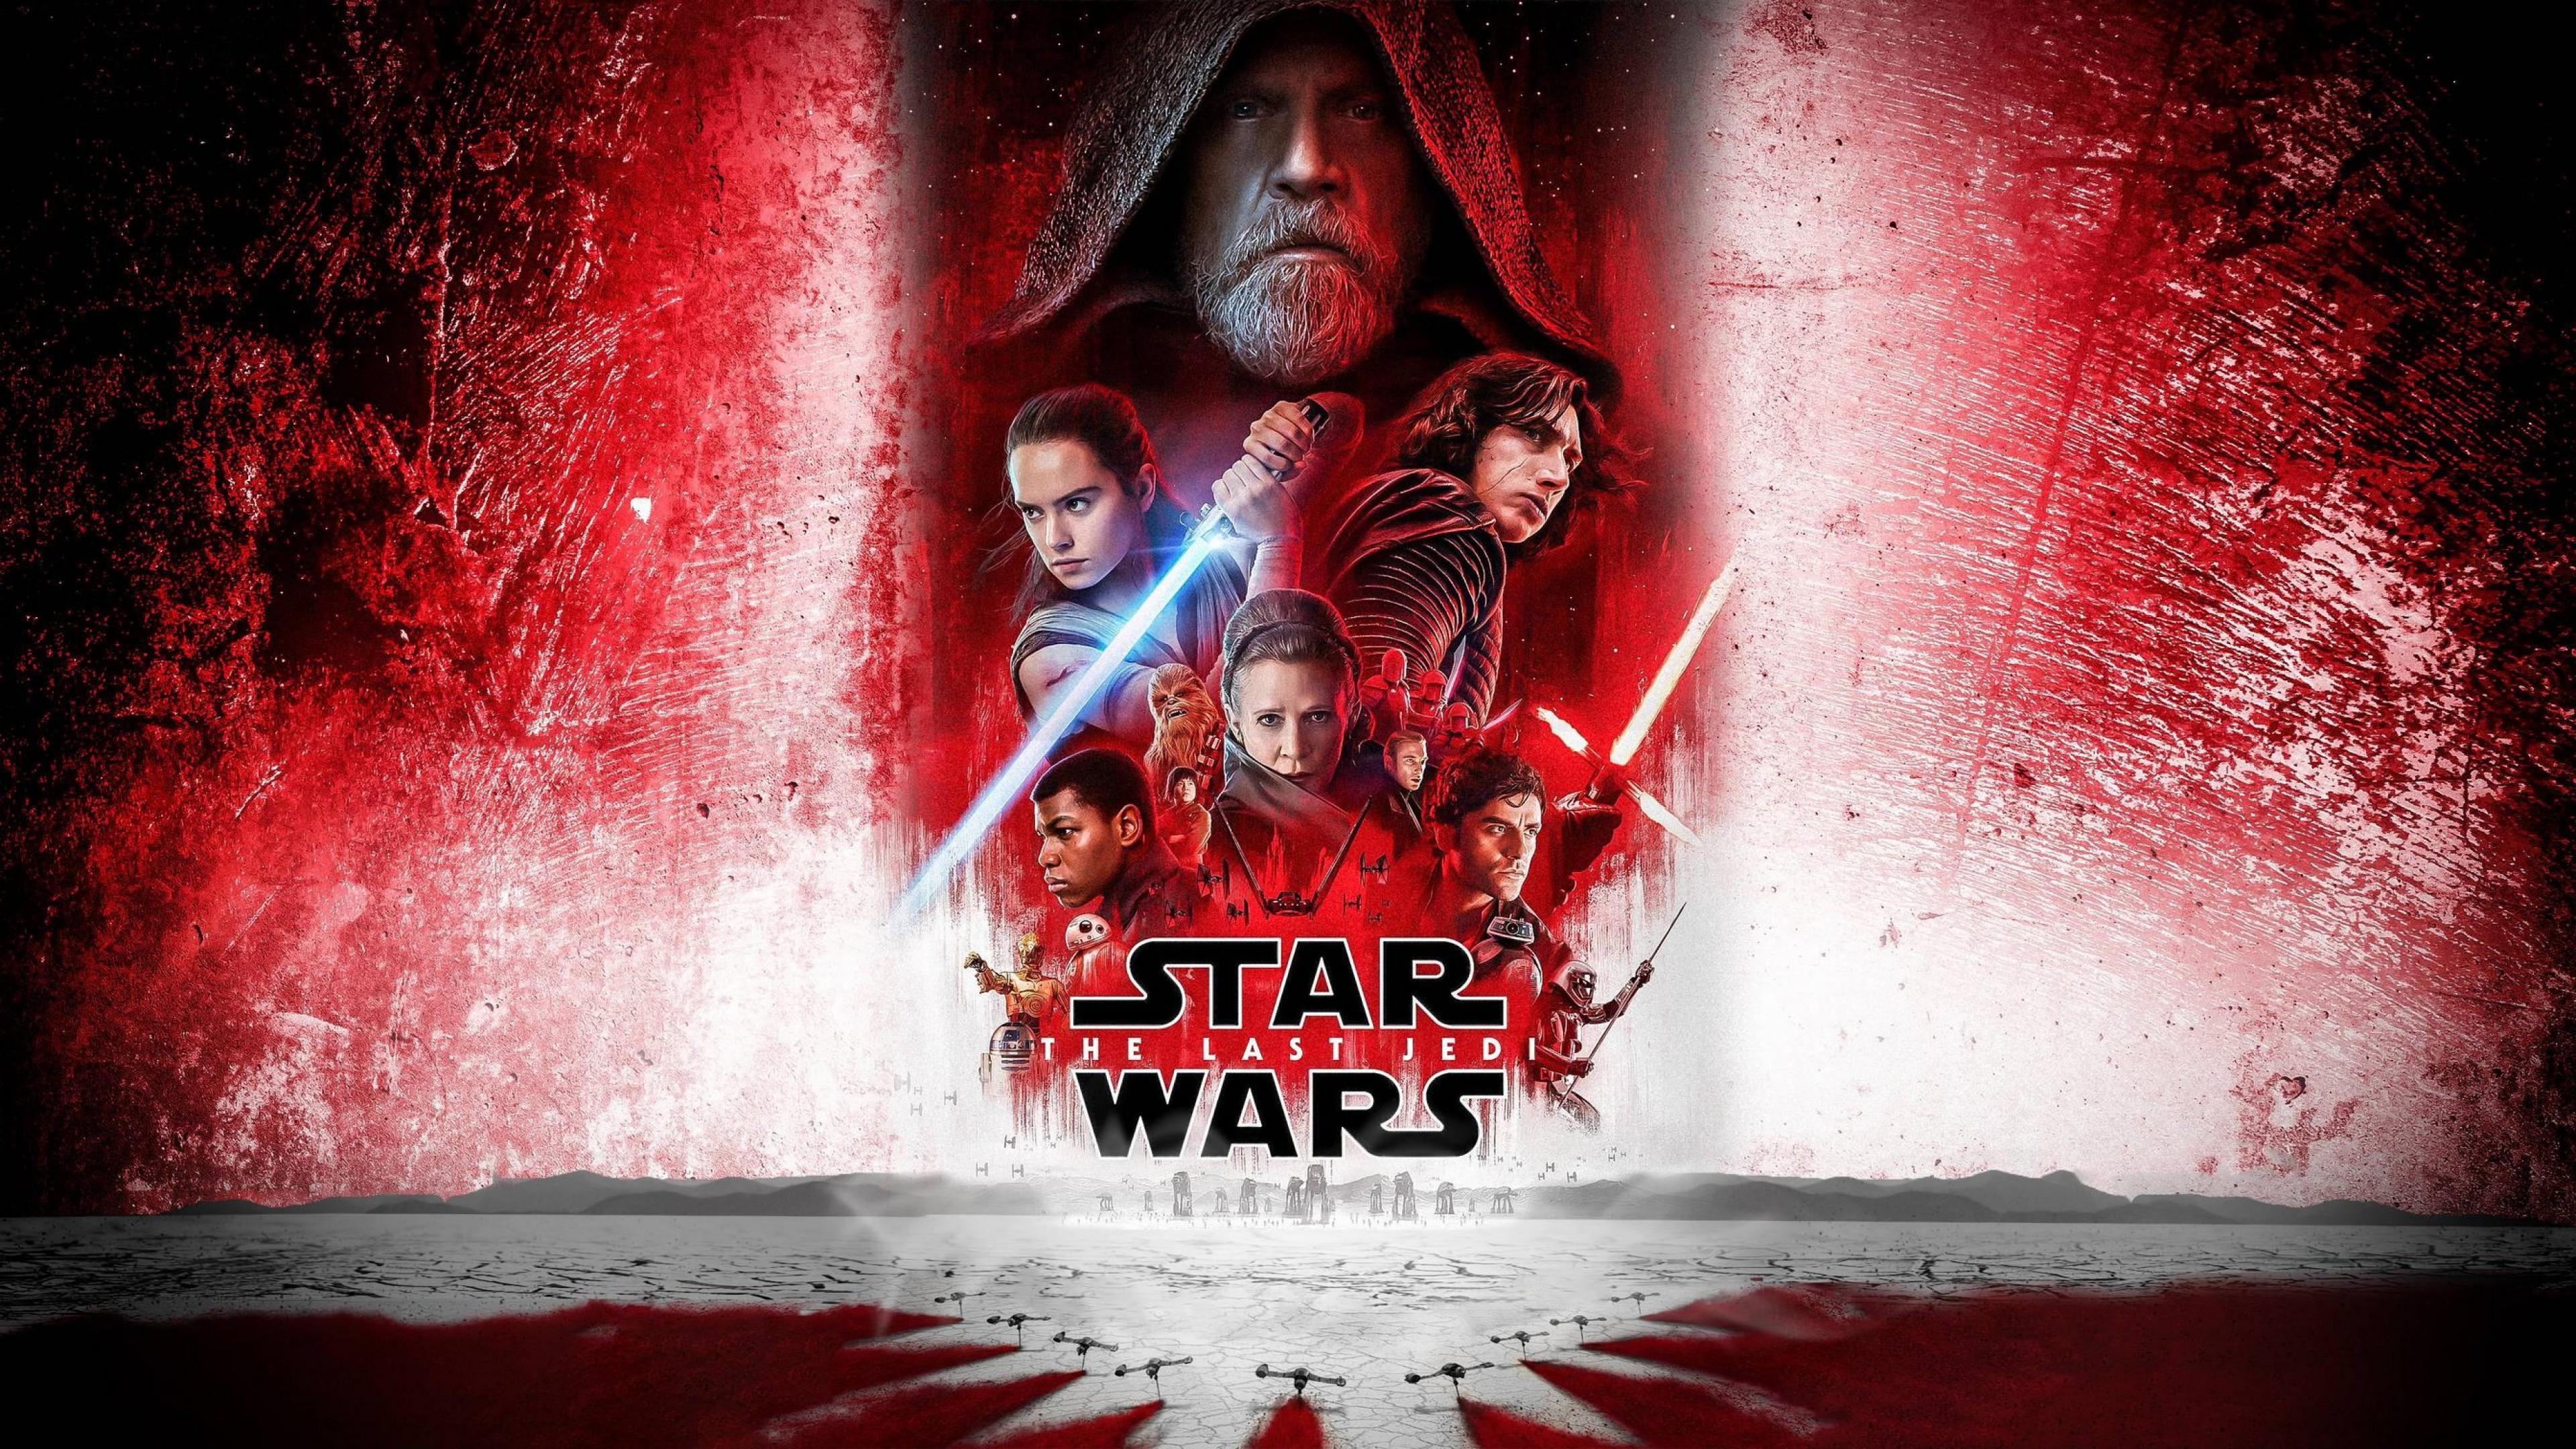 Free Download Star Wars The Last Jedi Hd Wallpaper For Desktop And